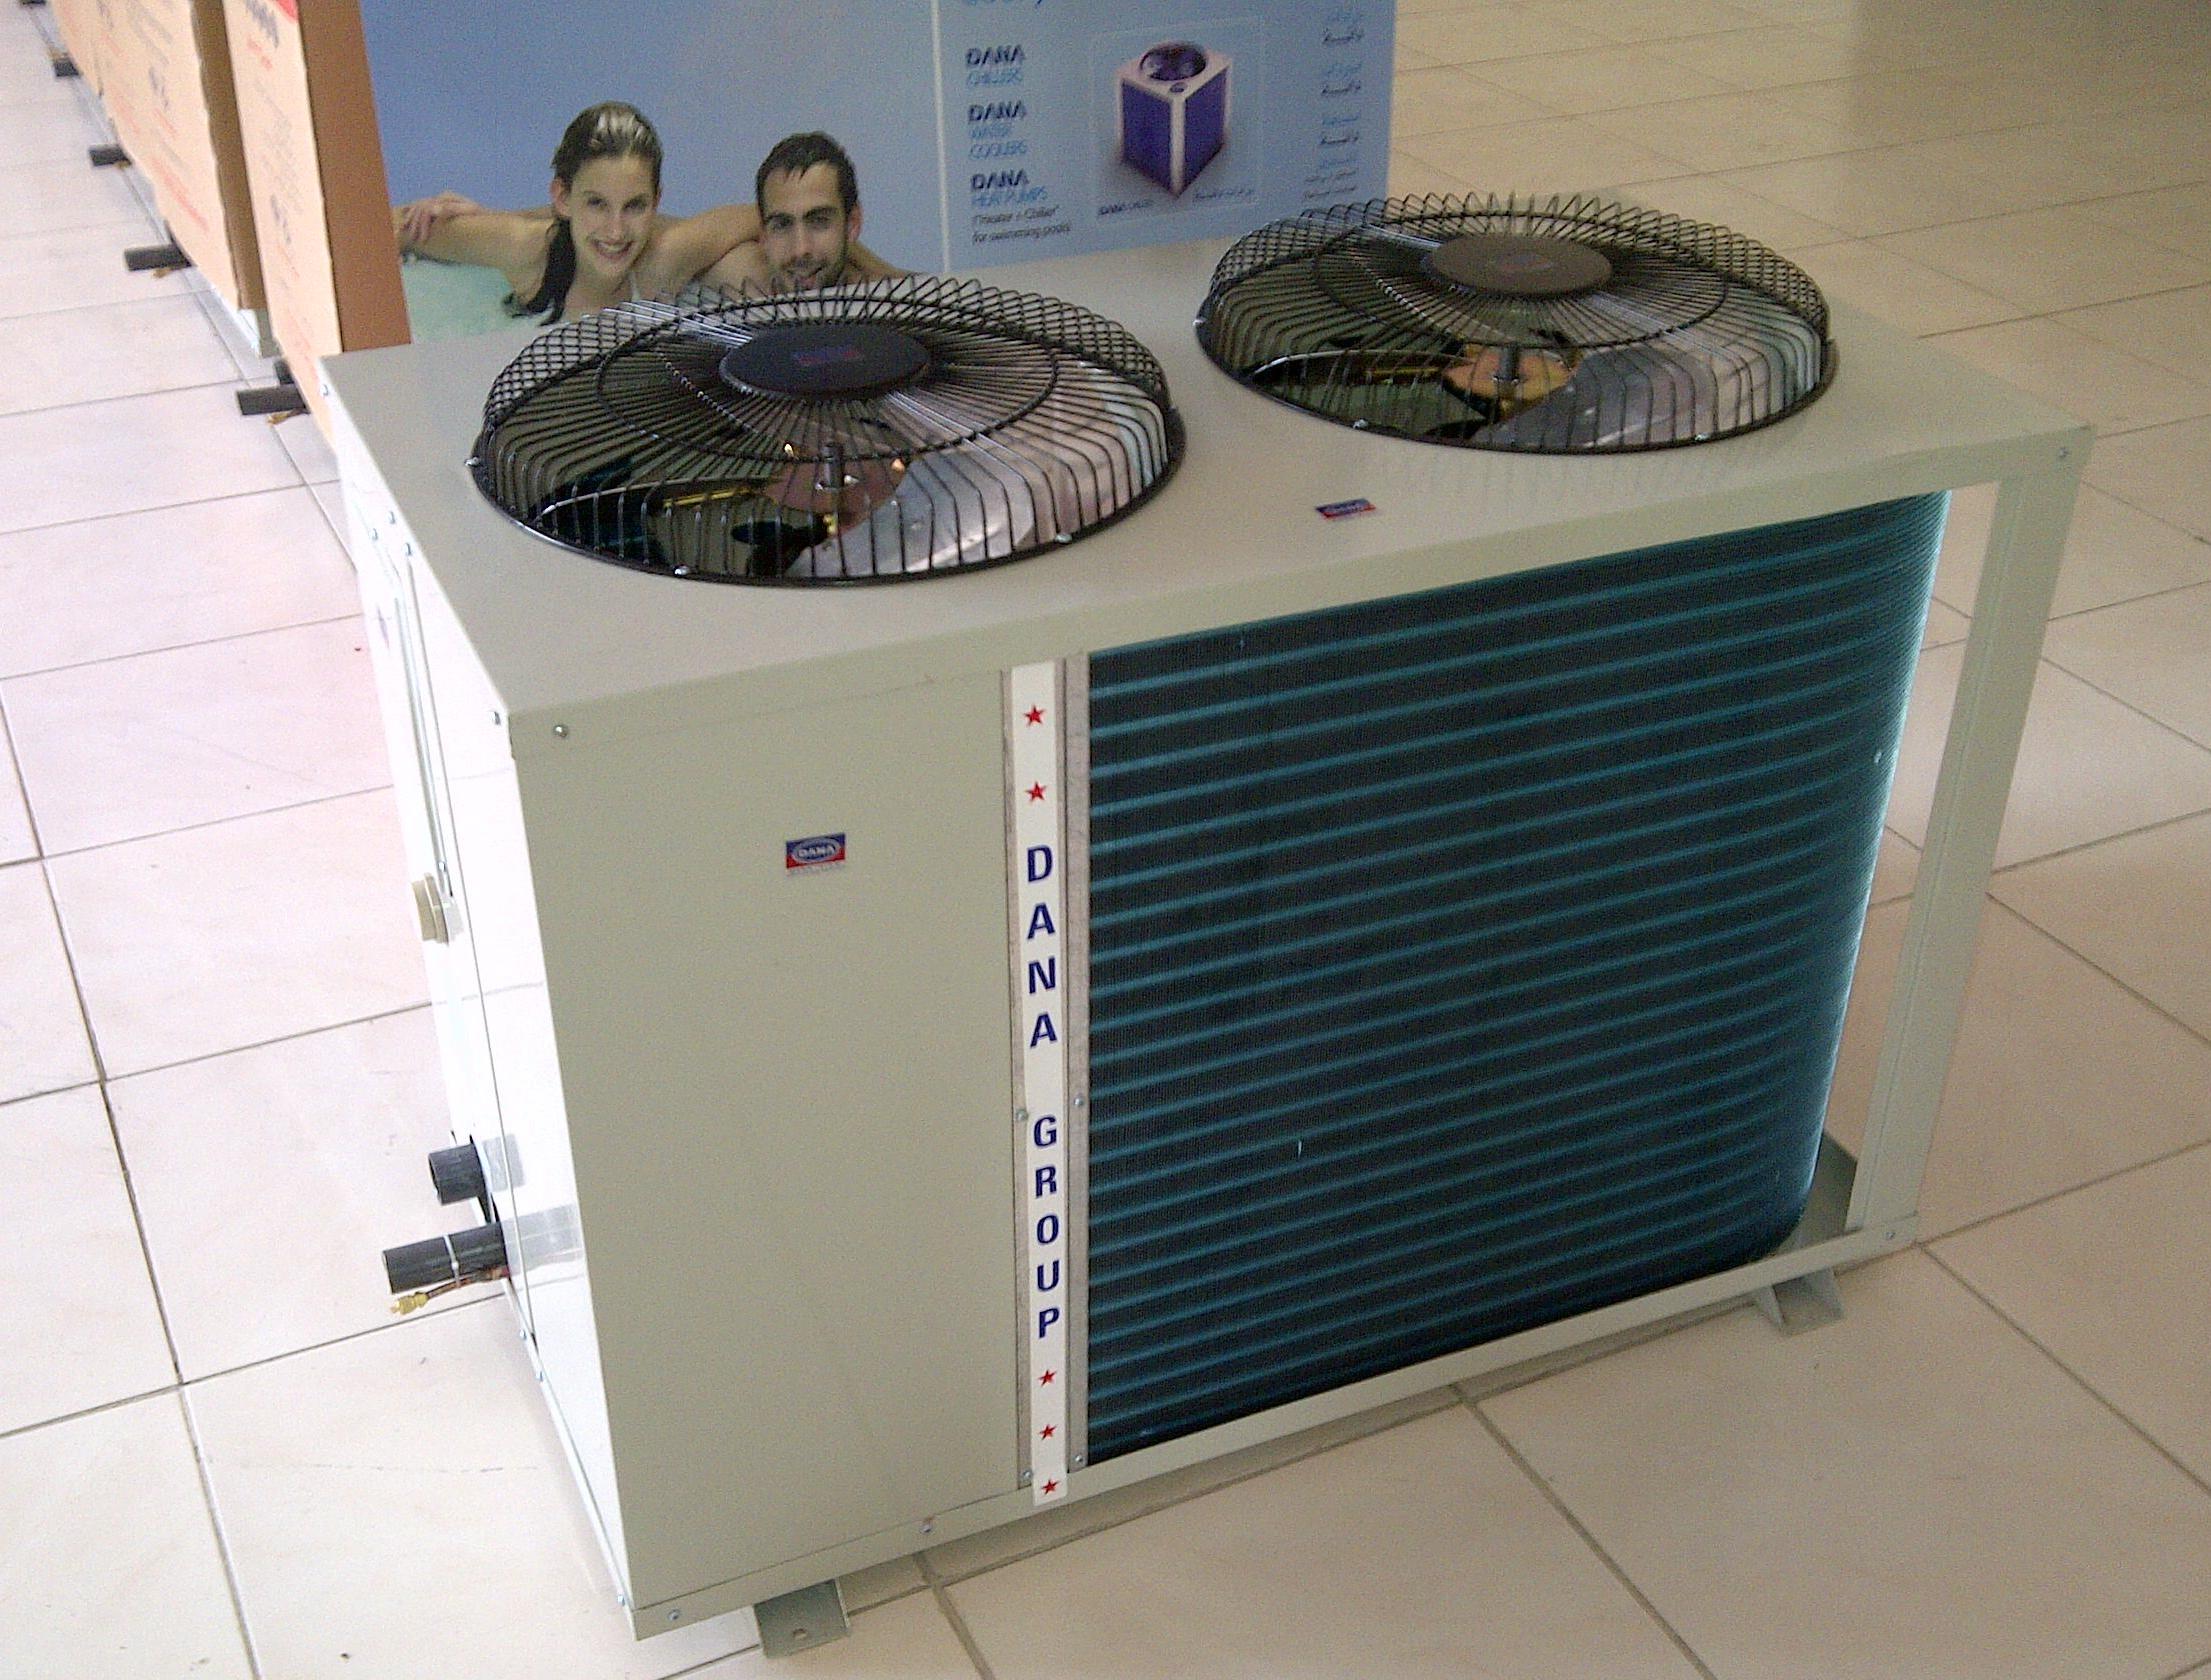 DANA water chiller in UAE (DC -2500) QATAR